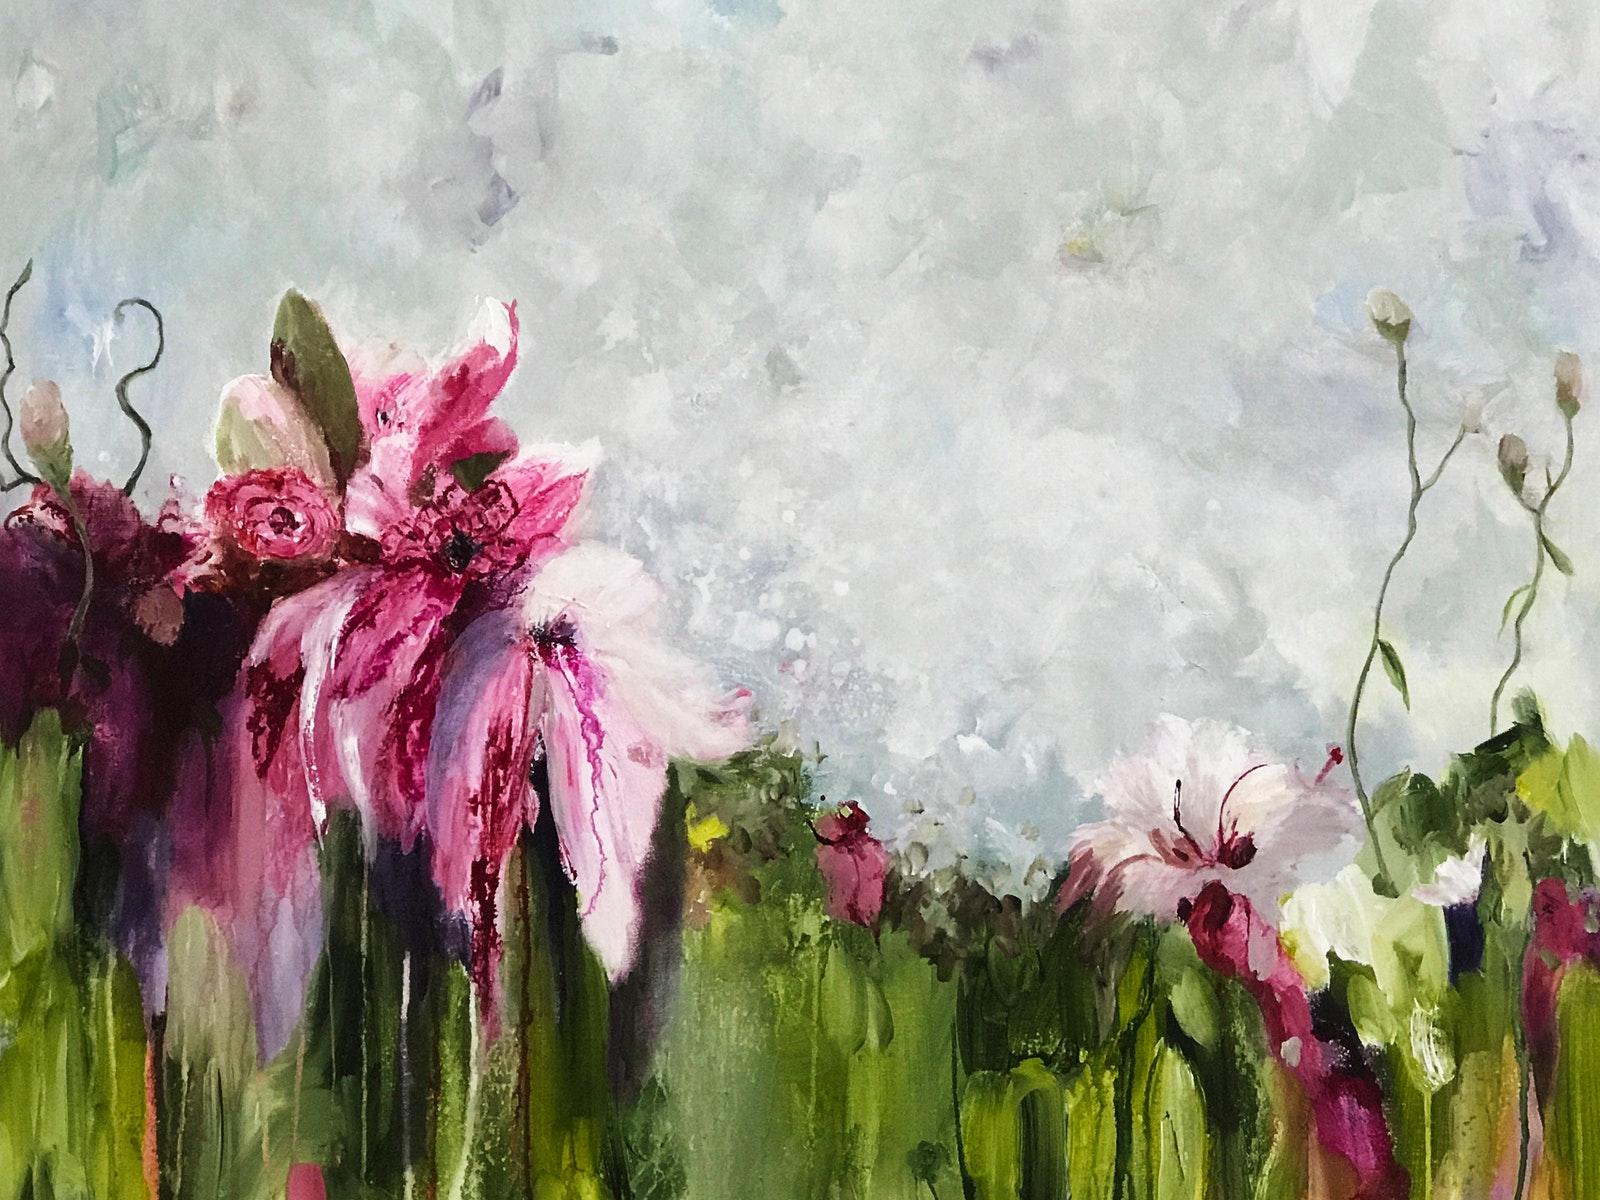 Lynne Bickhoff - Delicate Inspirations